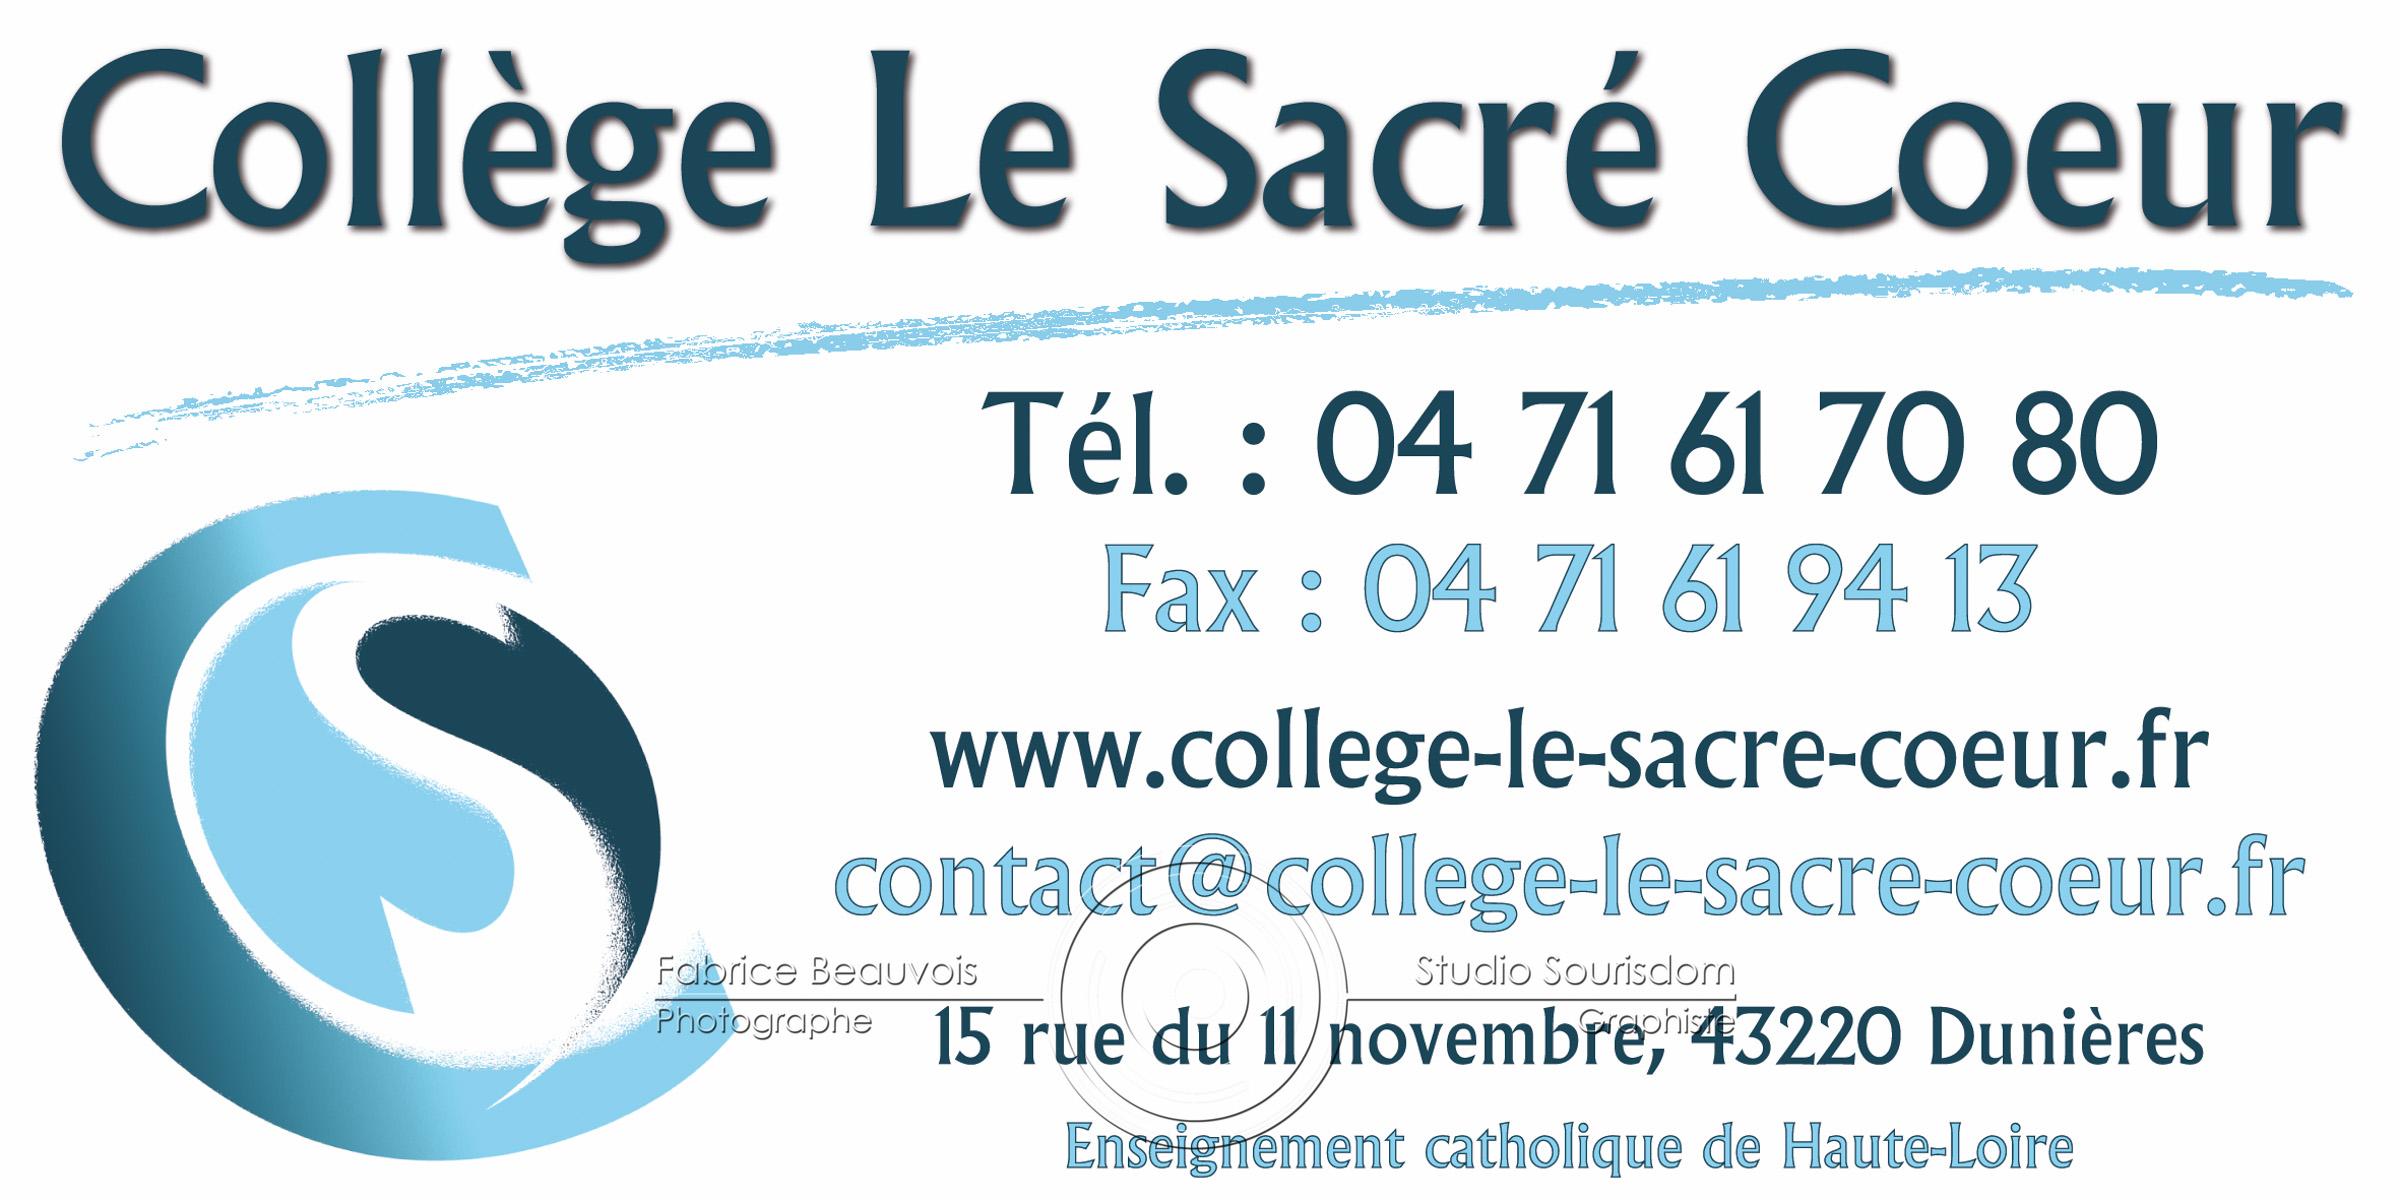 http://www.sourisdom.fr/print/logos/agrd/exterieur/exterieur-studio-sourisdom-0006.jpg